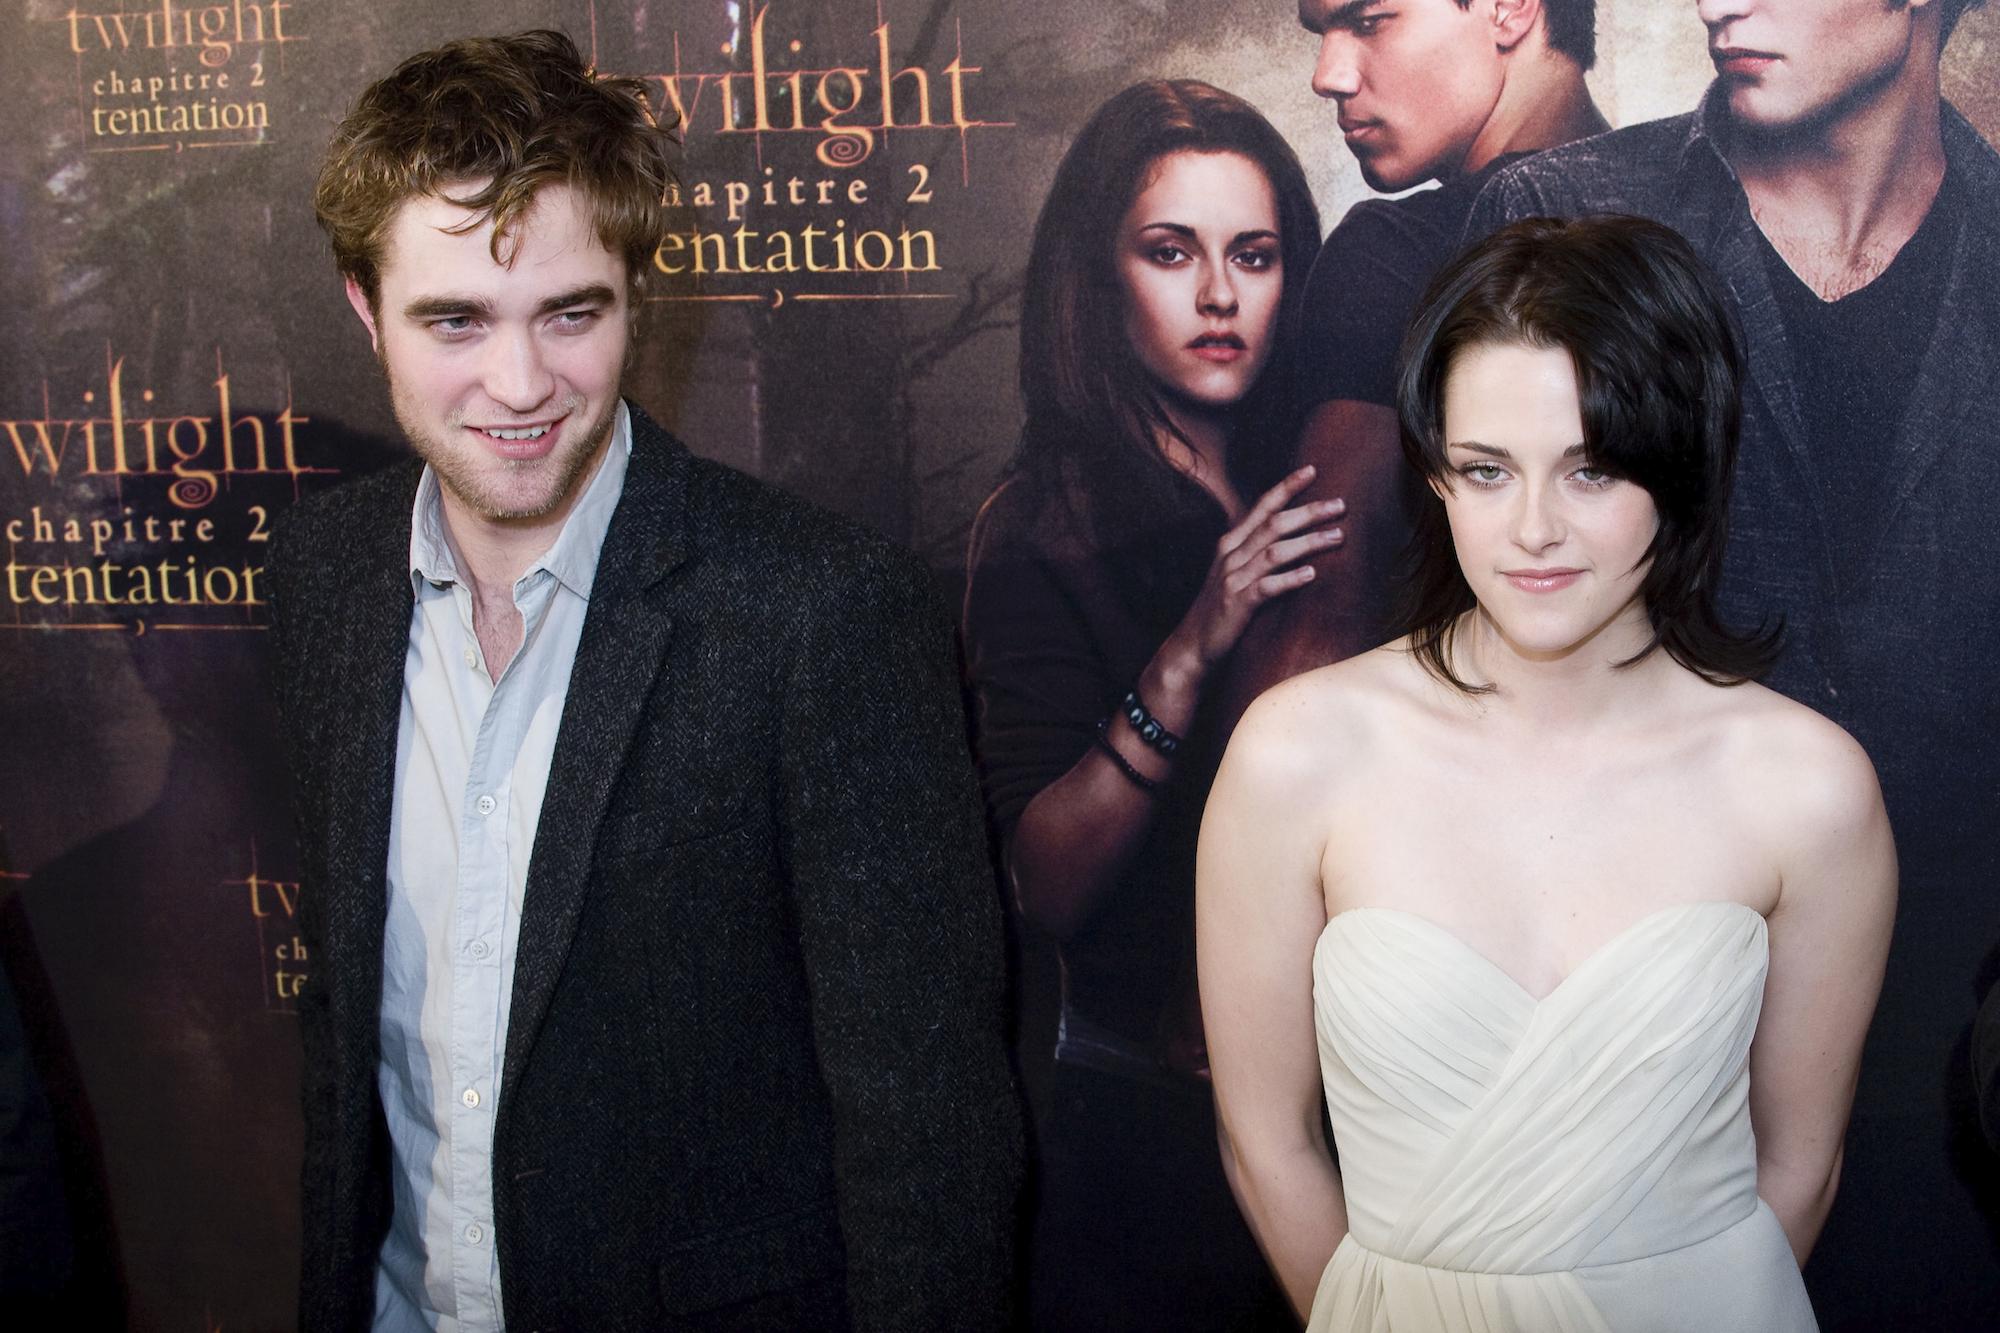 Robert Pattinson and Kristen Stewart at the 'The Twilight Saga: New Moon' premiere in Paris.